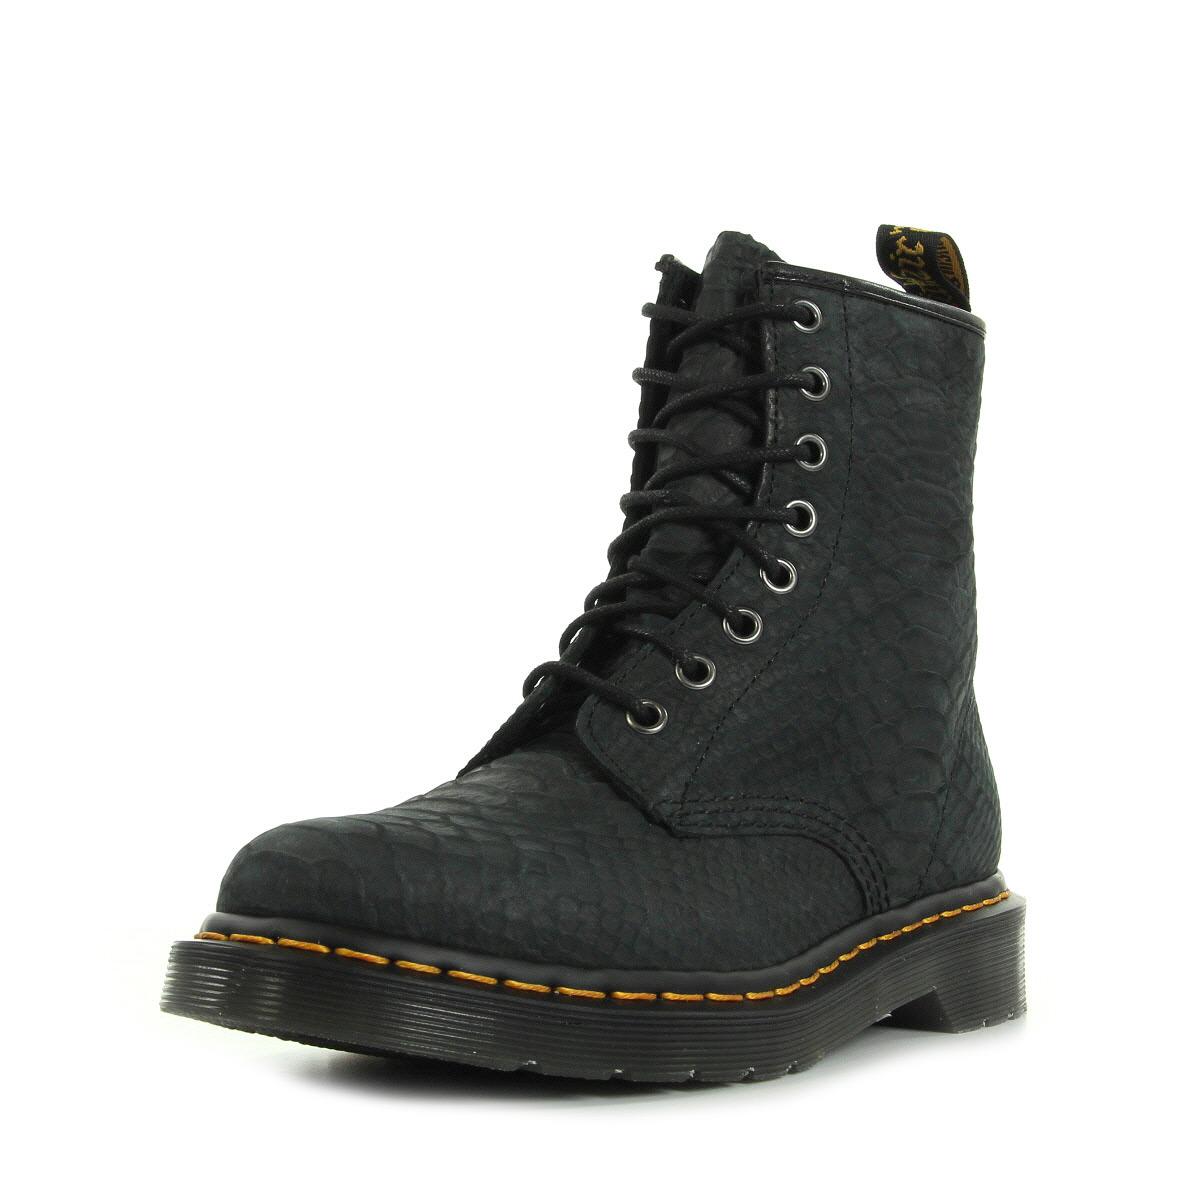 chaussures boots dr martens femme 1460 taille noir noire cuir lacets ebay. Black Bedroom Furniture Sets. Home Design Ideas